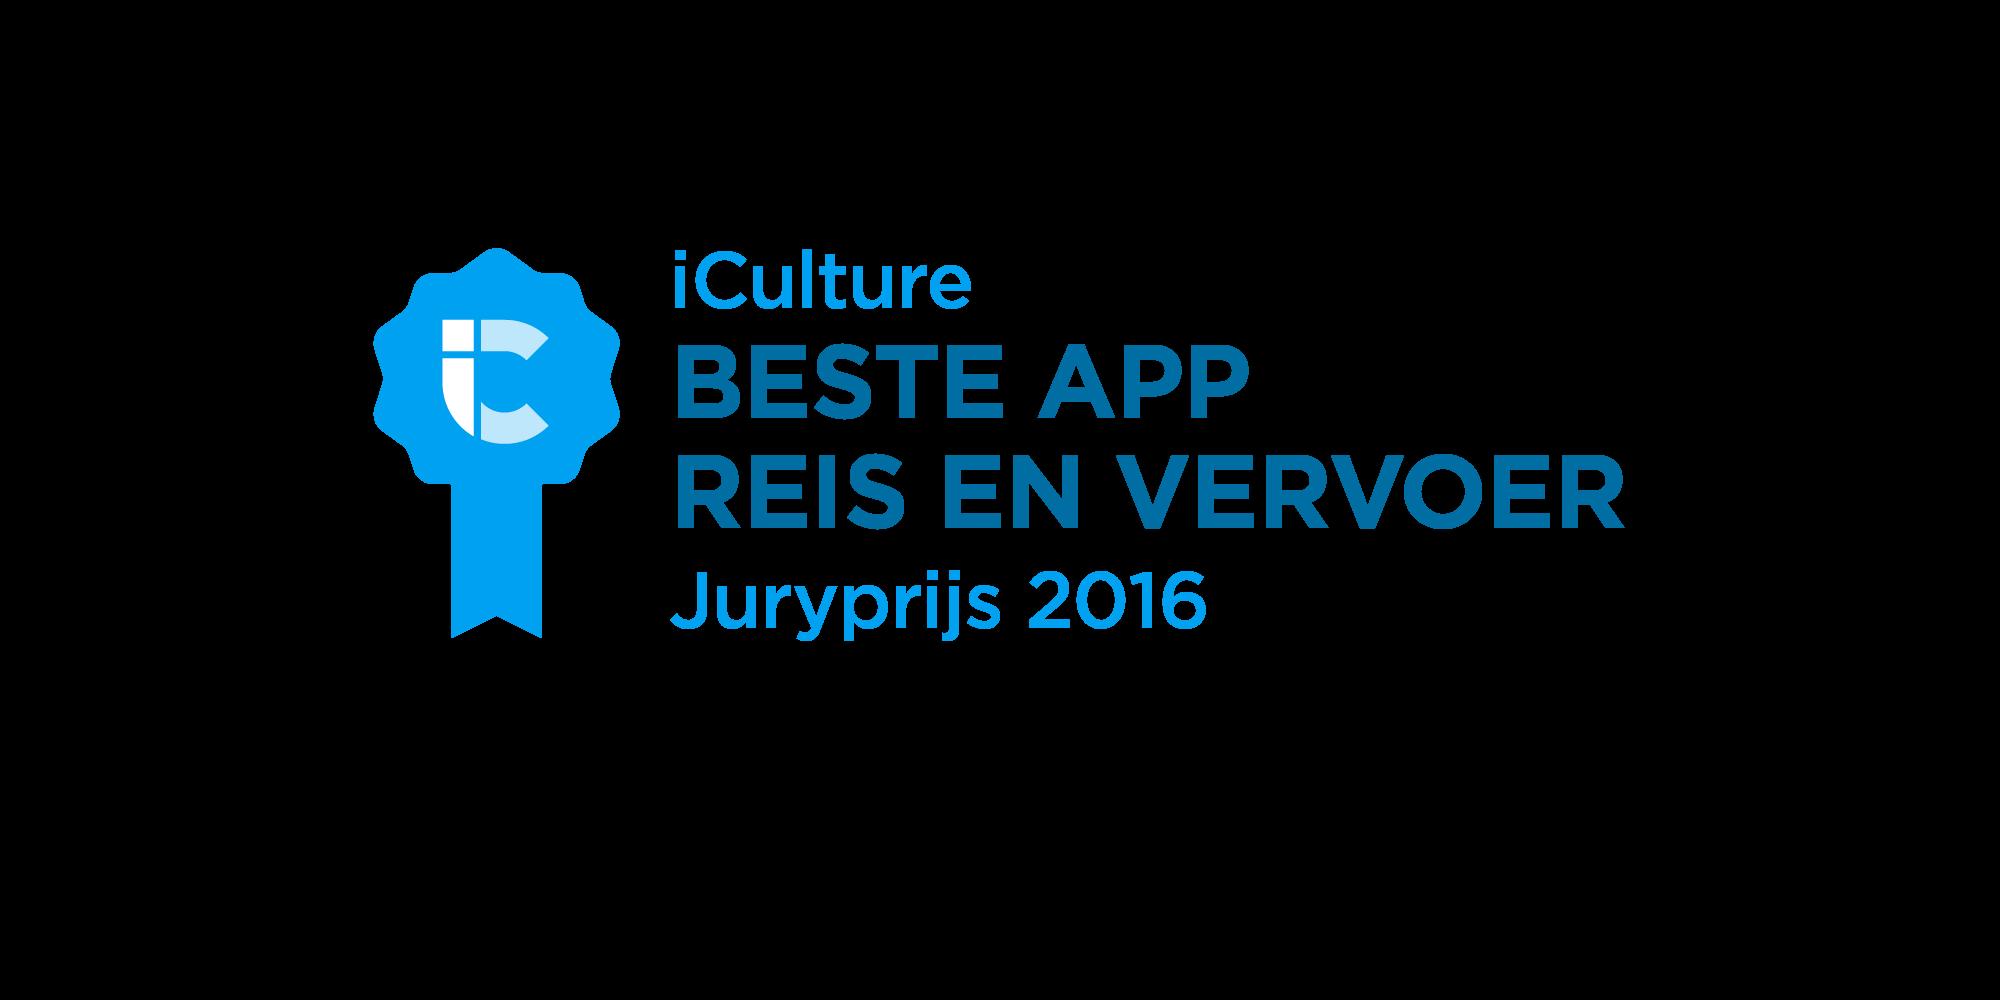 iCulture Beste App Reis en Vervoer 2016